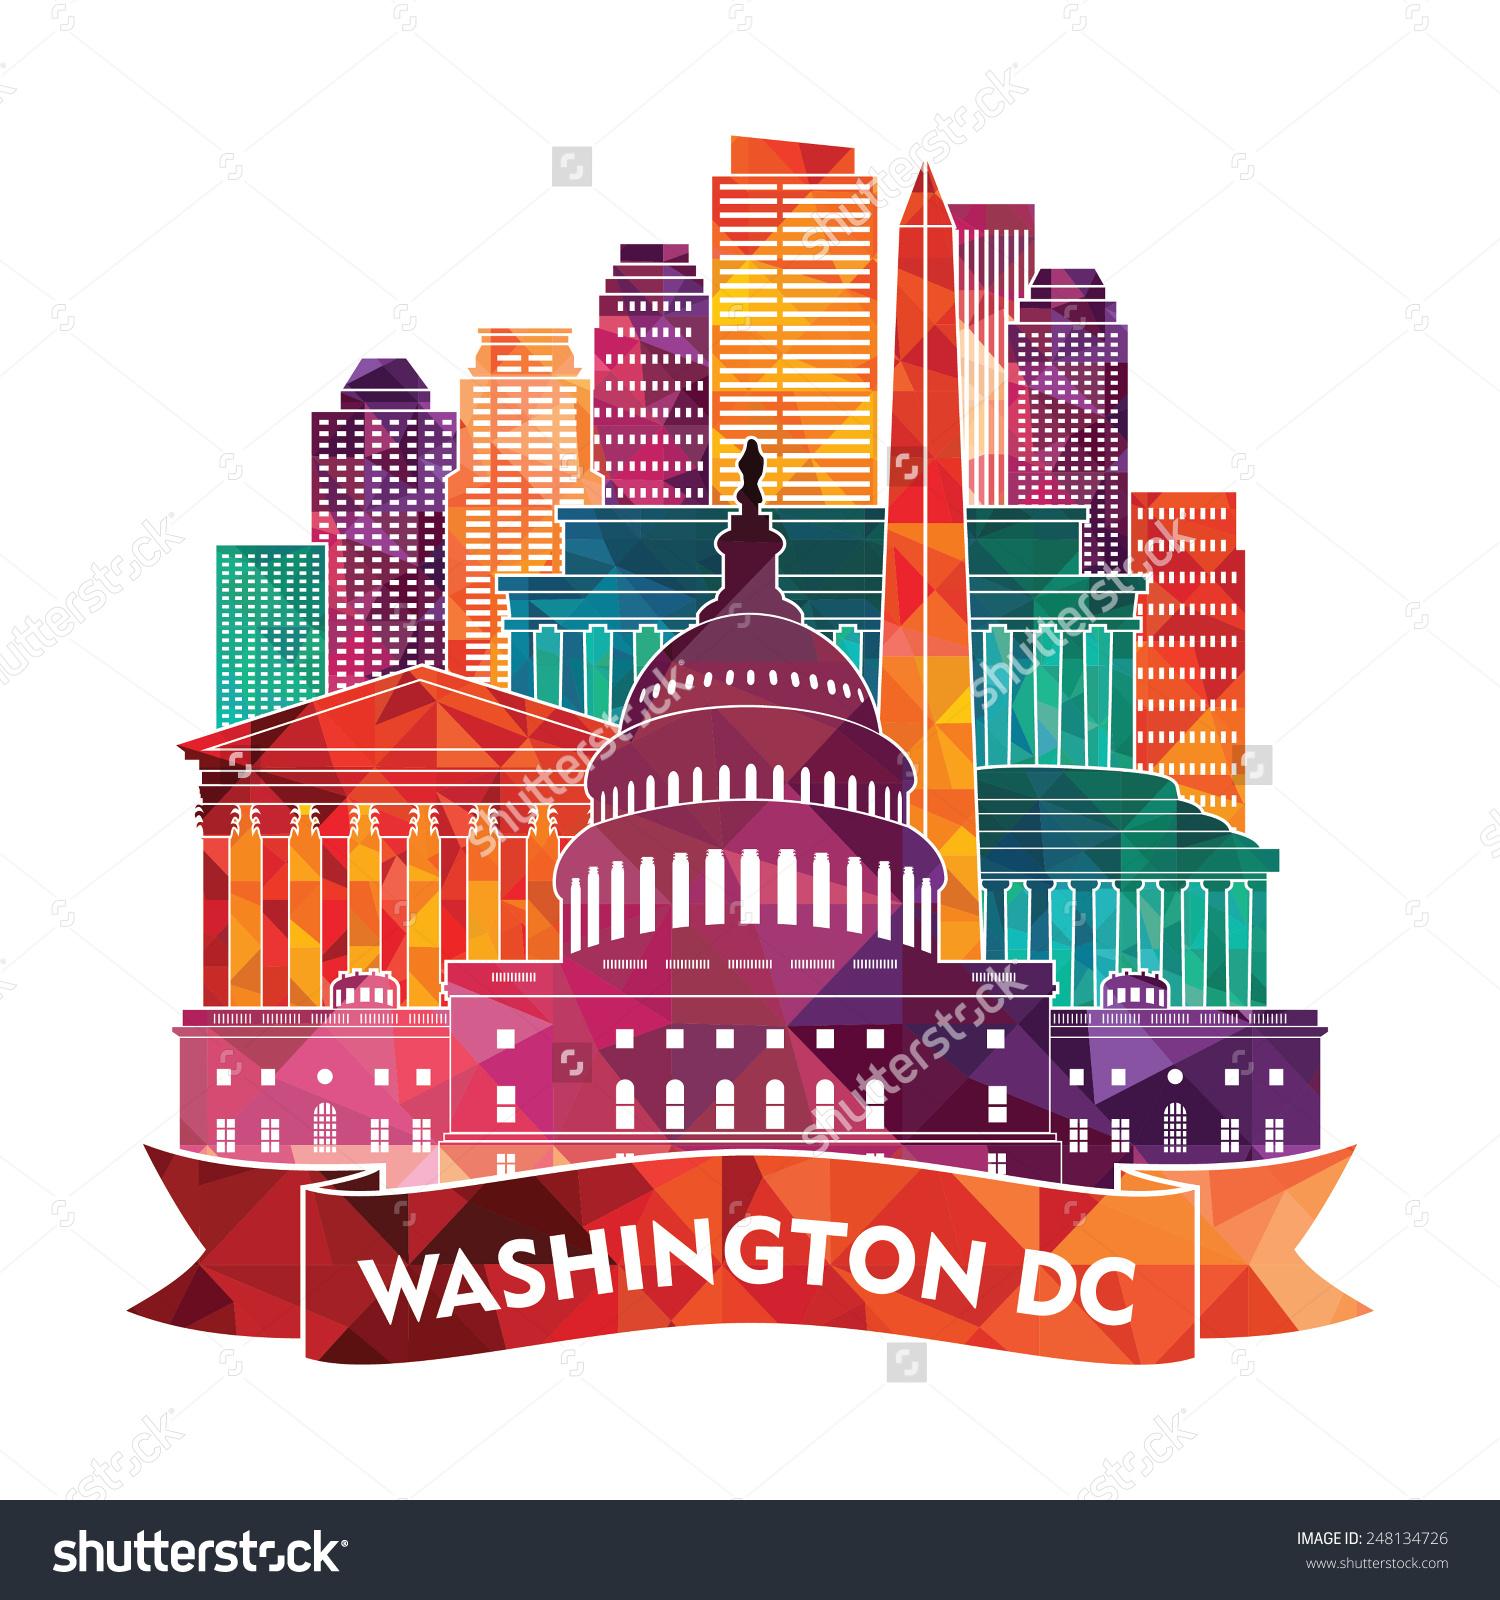 Washington dc skyline clipart.